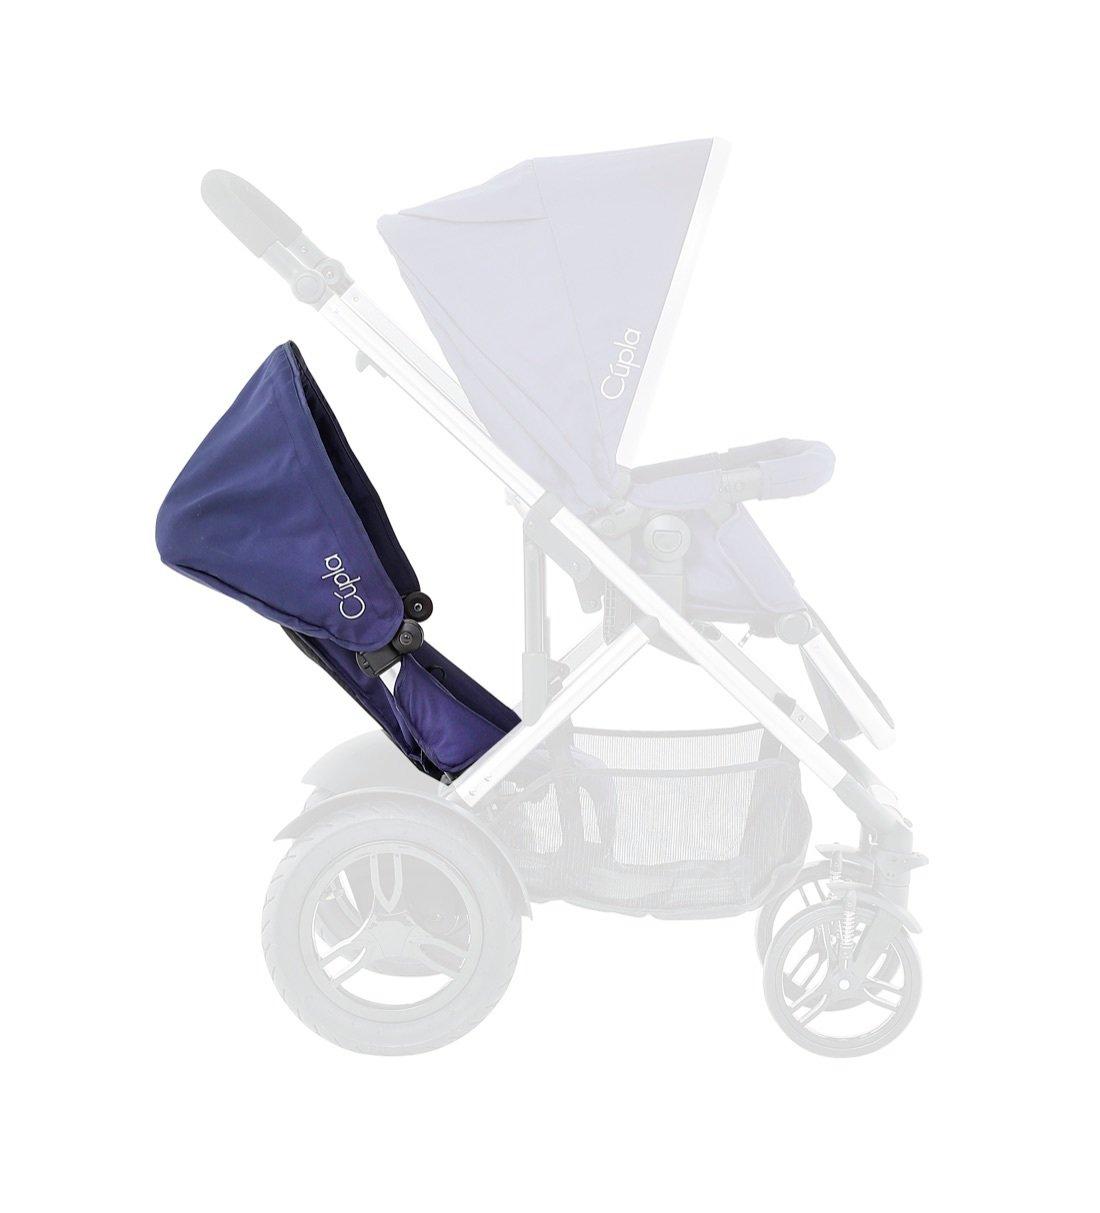 Image of Baby Elegance Cupla Toddler Seat - Navy Blue.